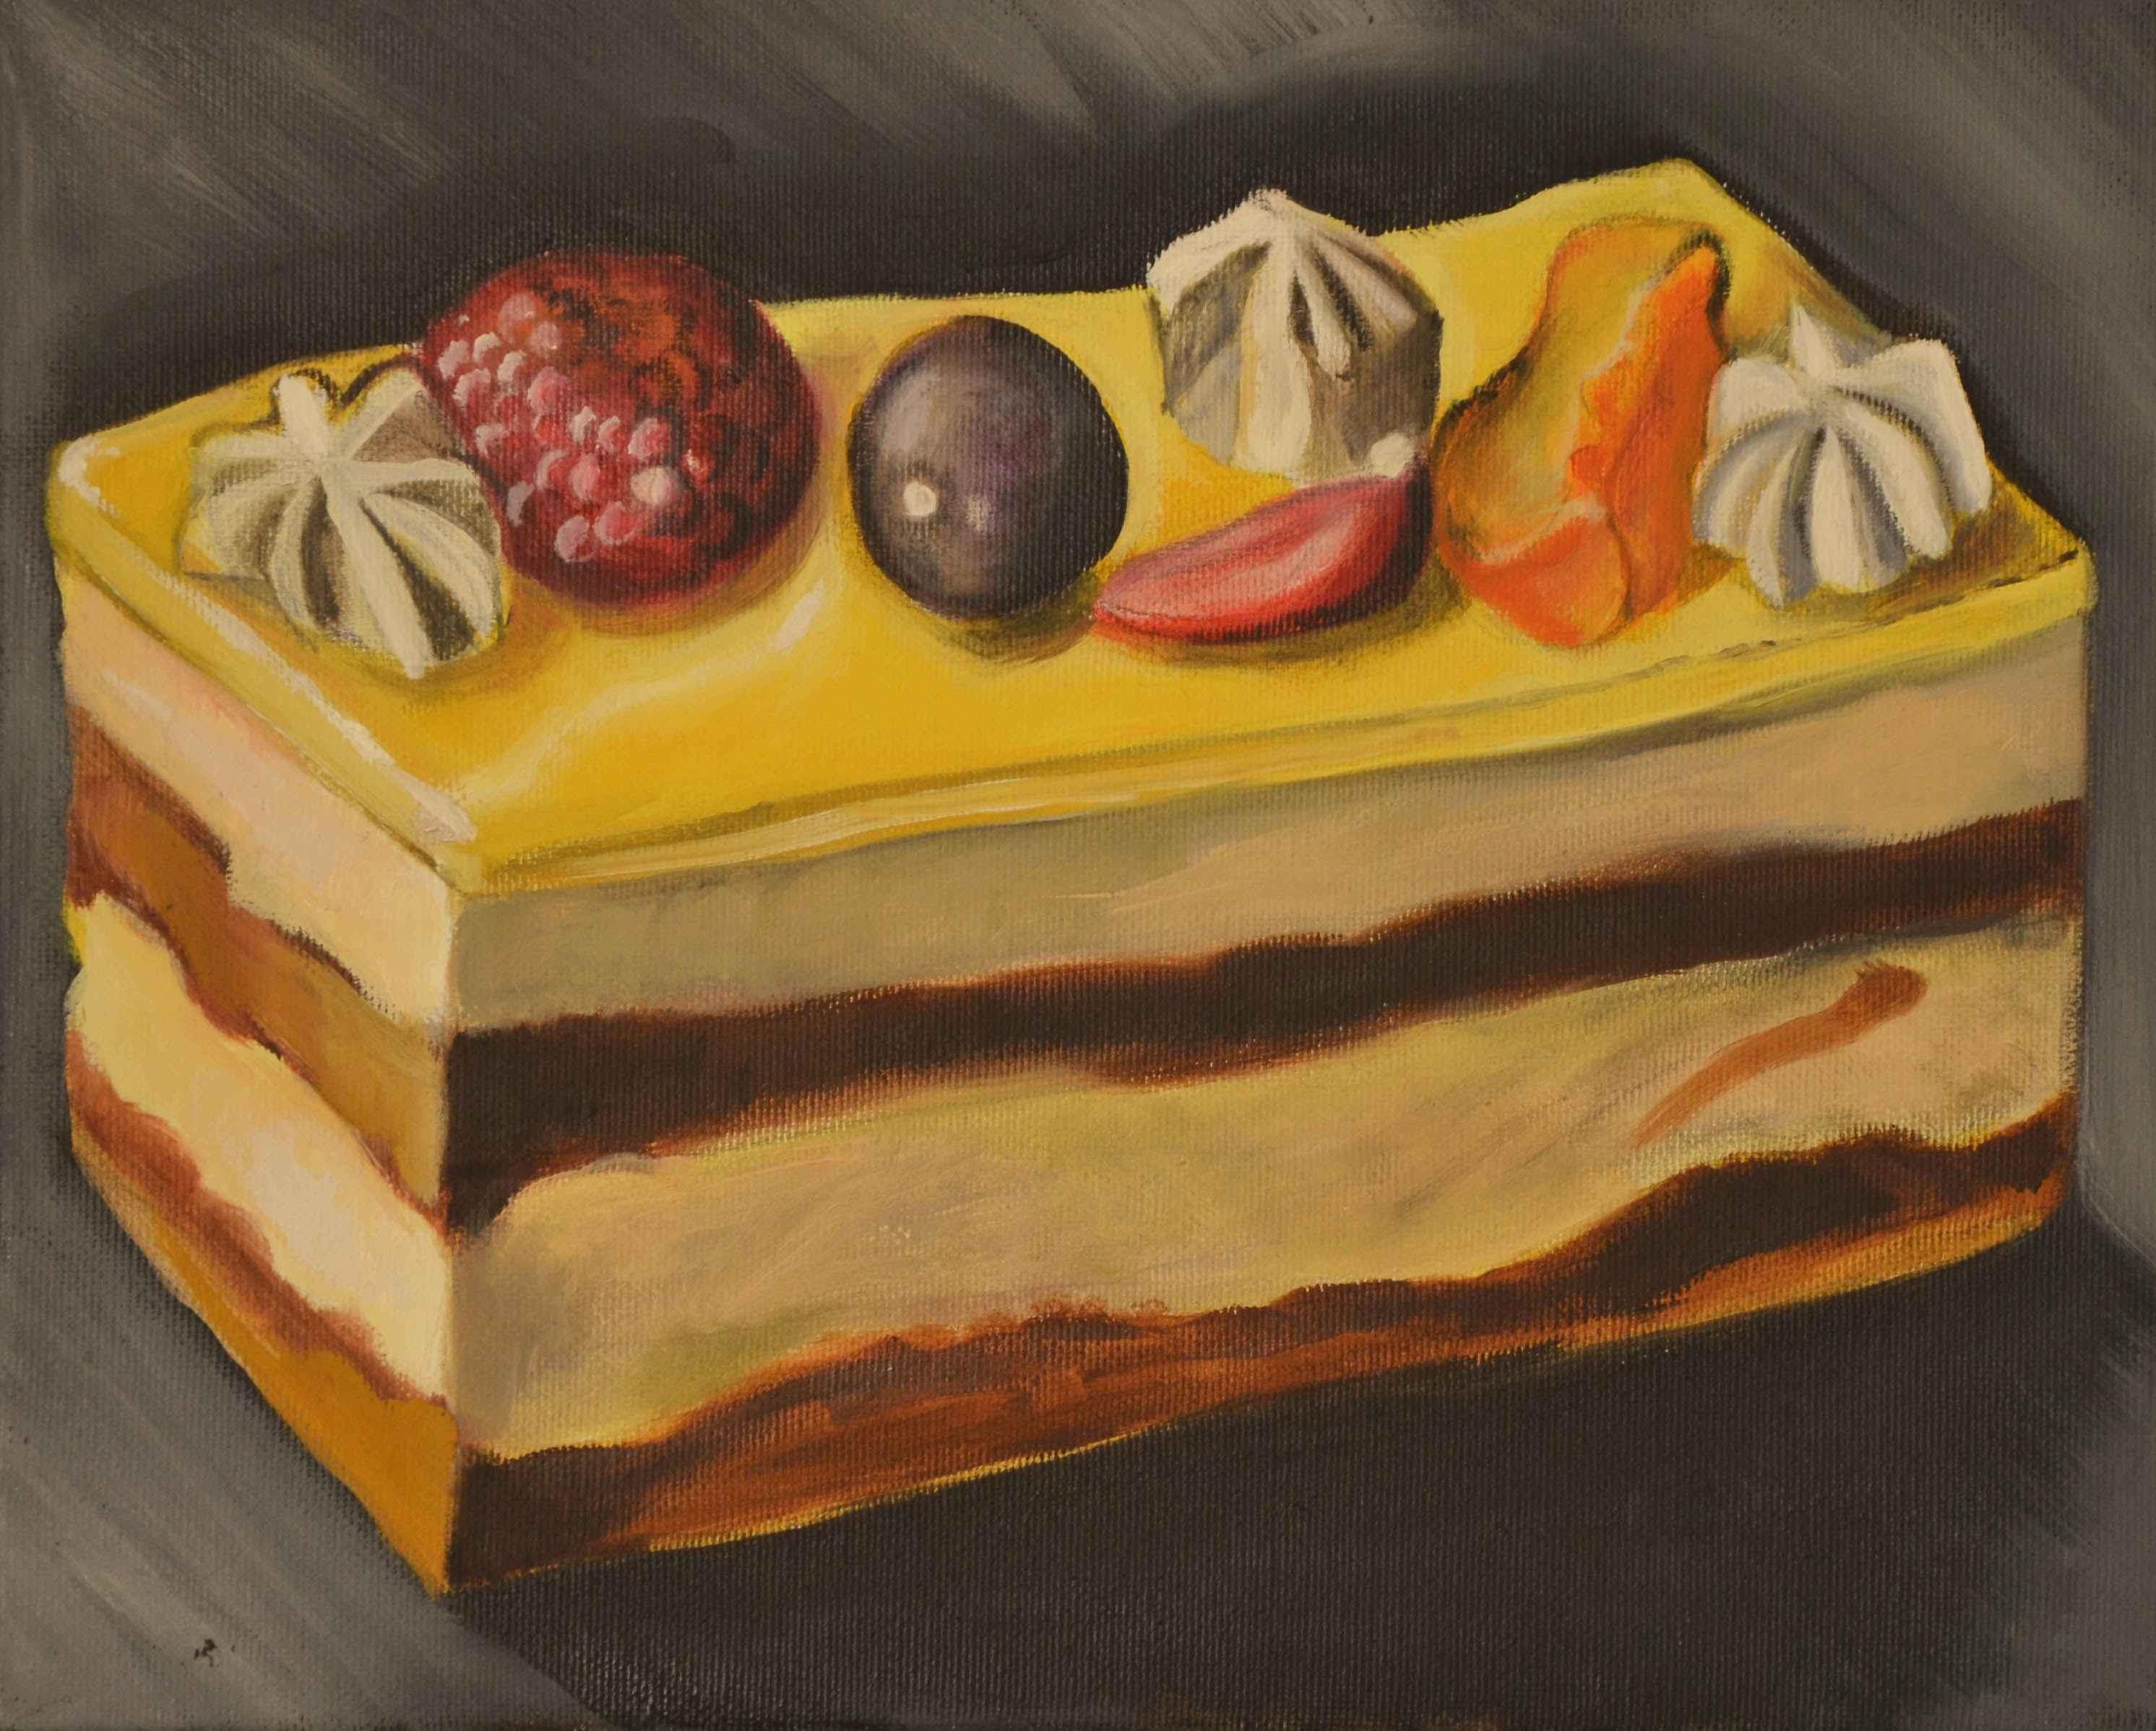 Gâteau aux Fruits II by Ms. Rebecca Vincenzi - Masterpiece Online